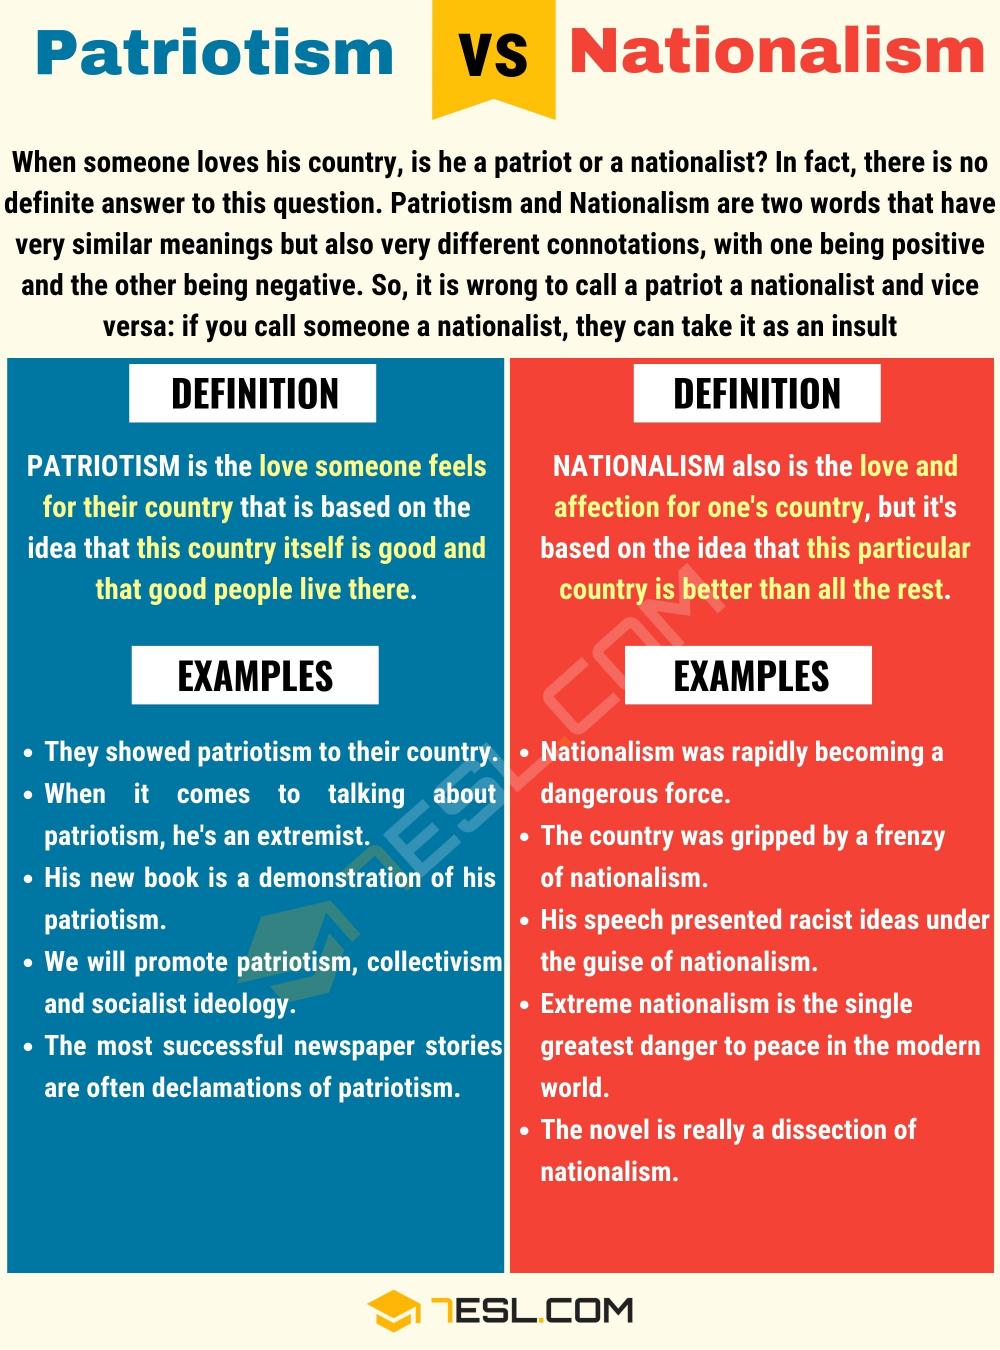 21 Patriotism میهن پرستی Ideas In 2021 Socialist Ideology Collectivism Mother Language Day